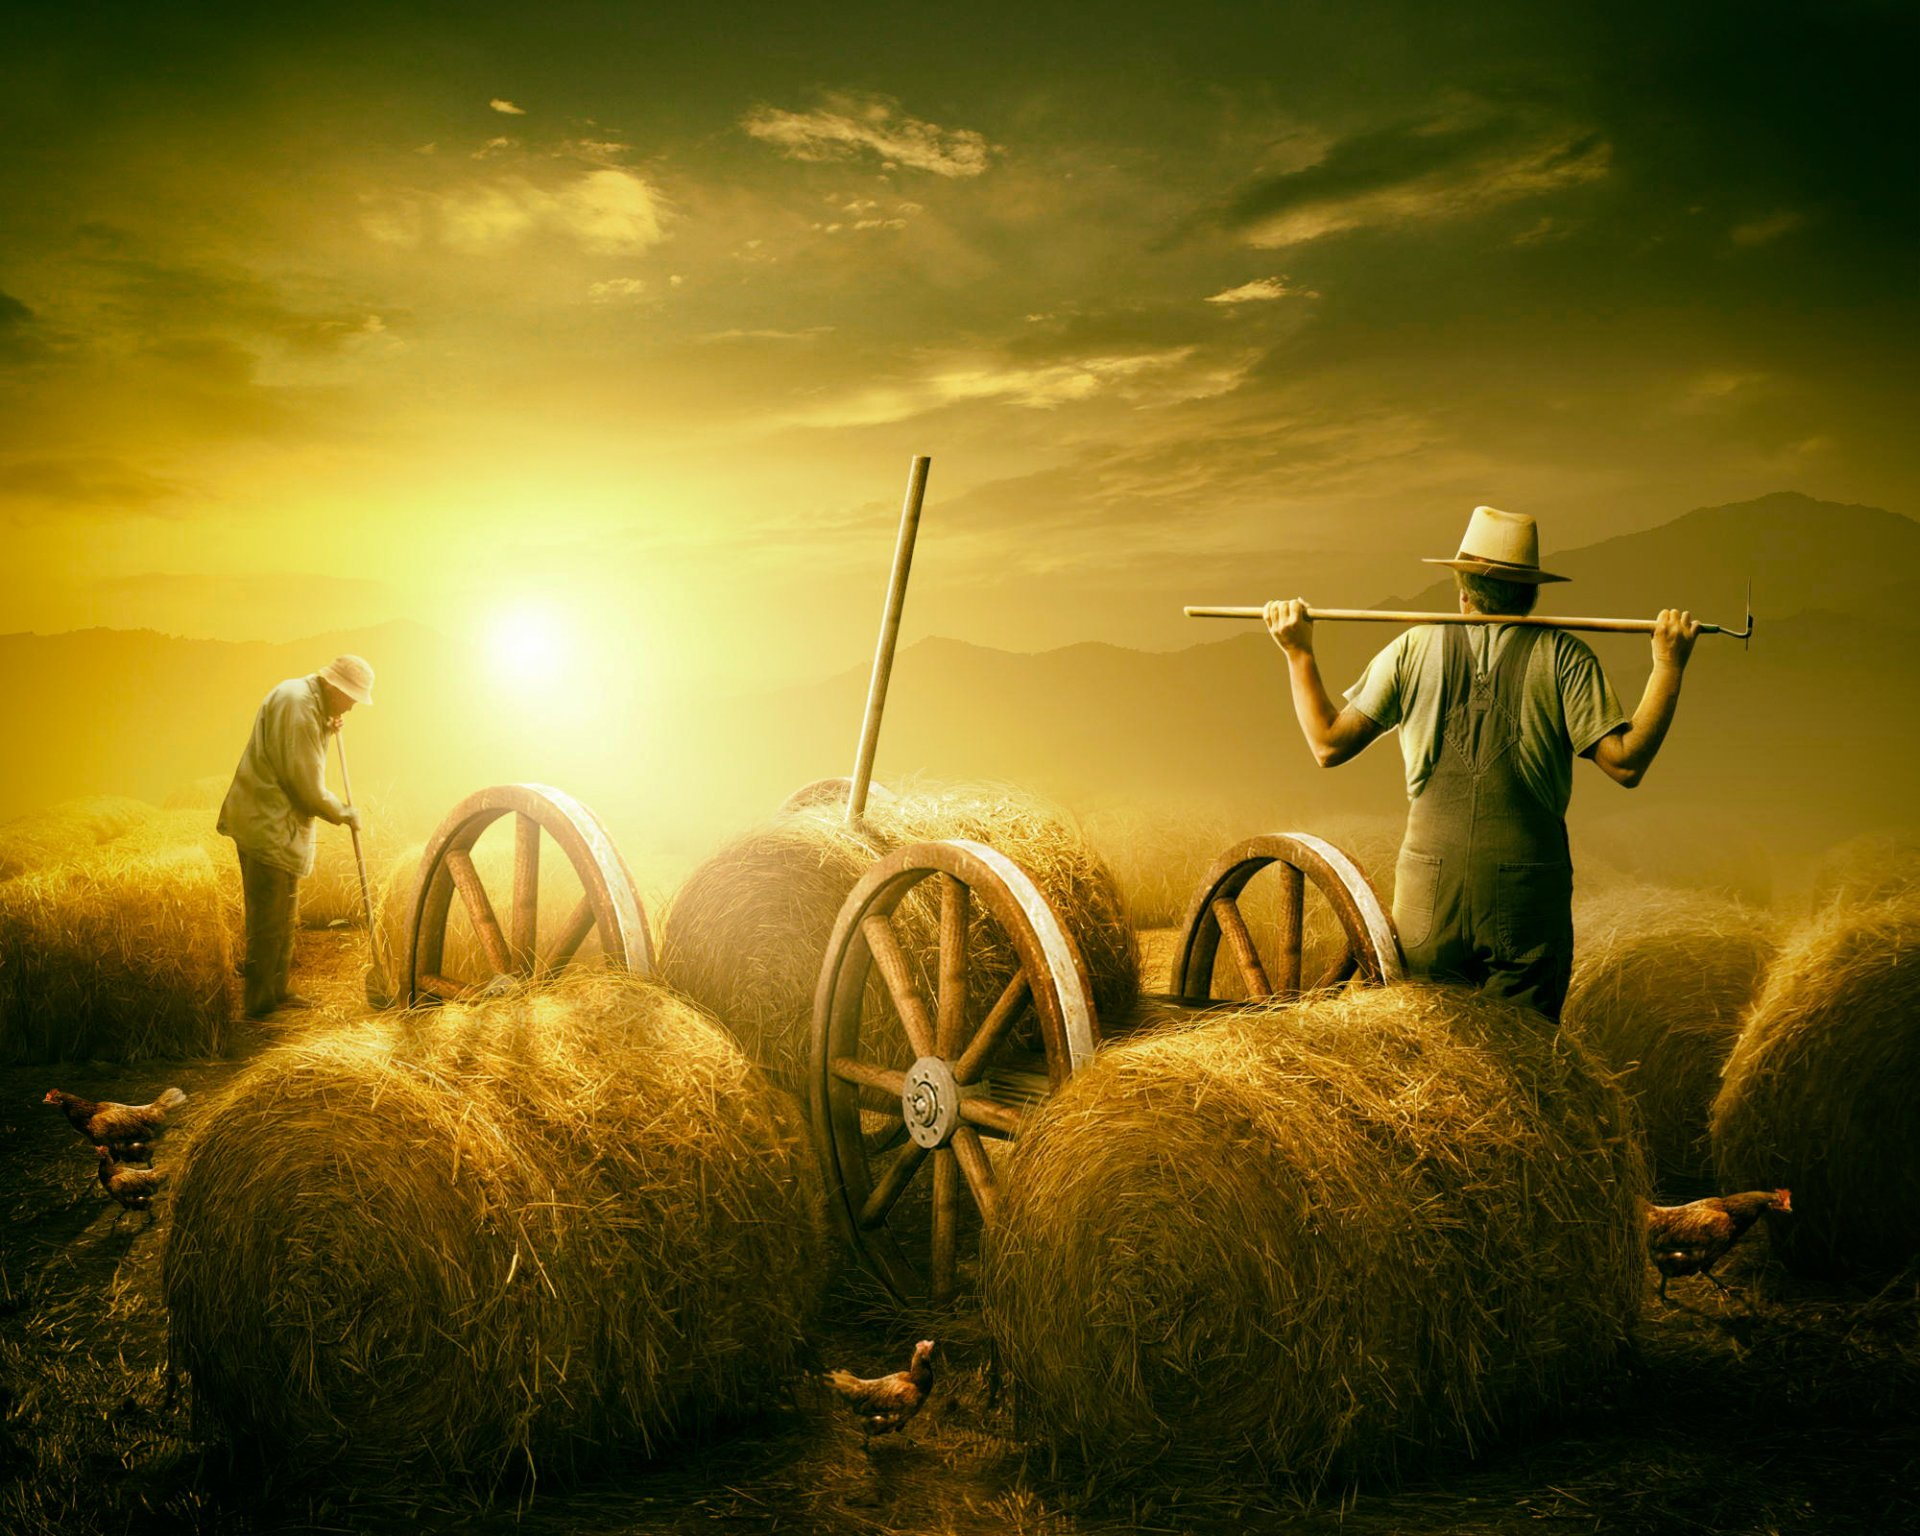 Best 38 Farmer Desktop Backgrounds on HipWallpaper Beautiful 1920x1536